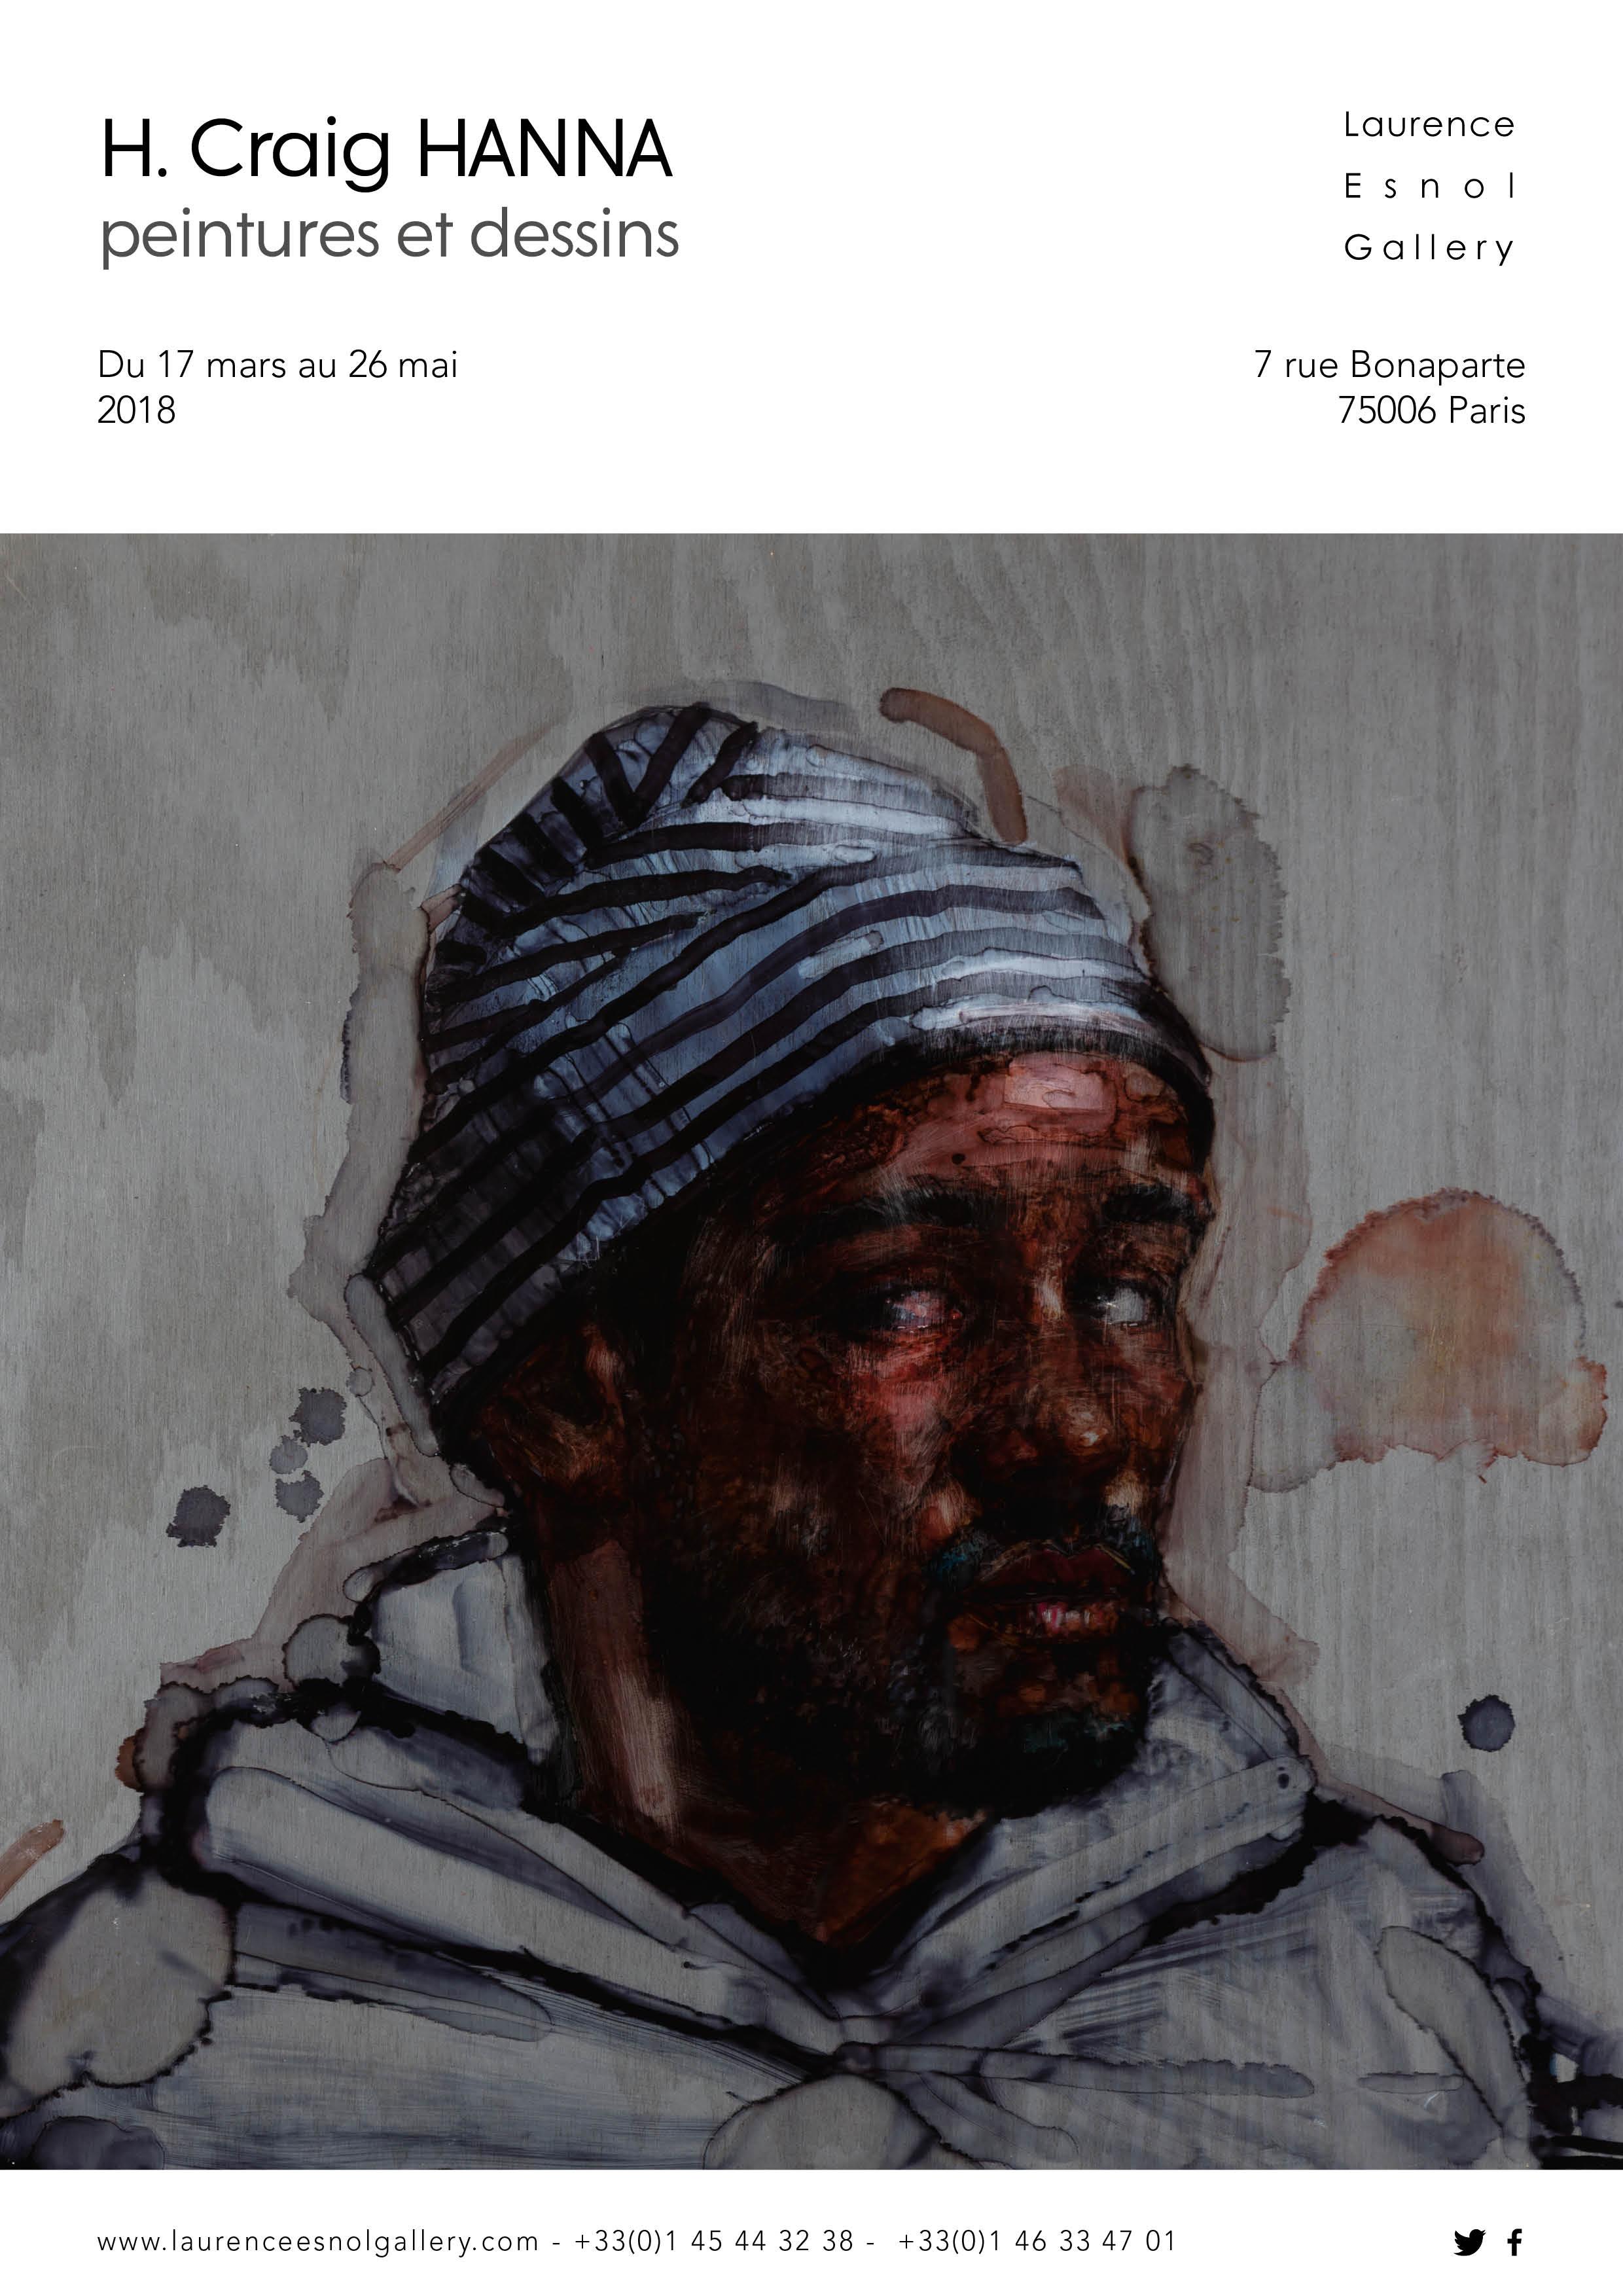 H. Craig HANNA - Peintures et dessins